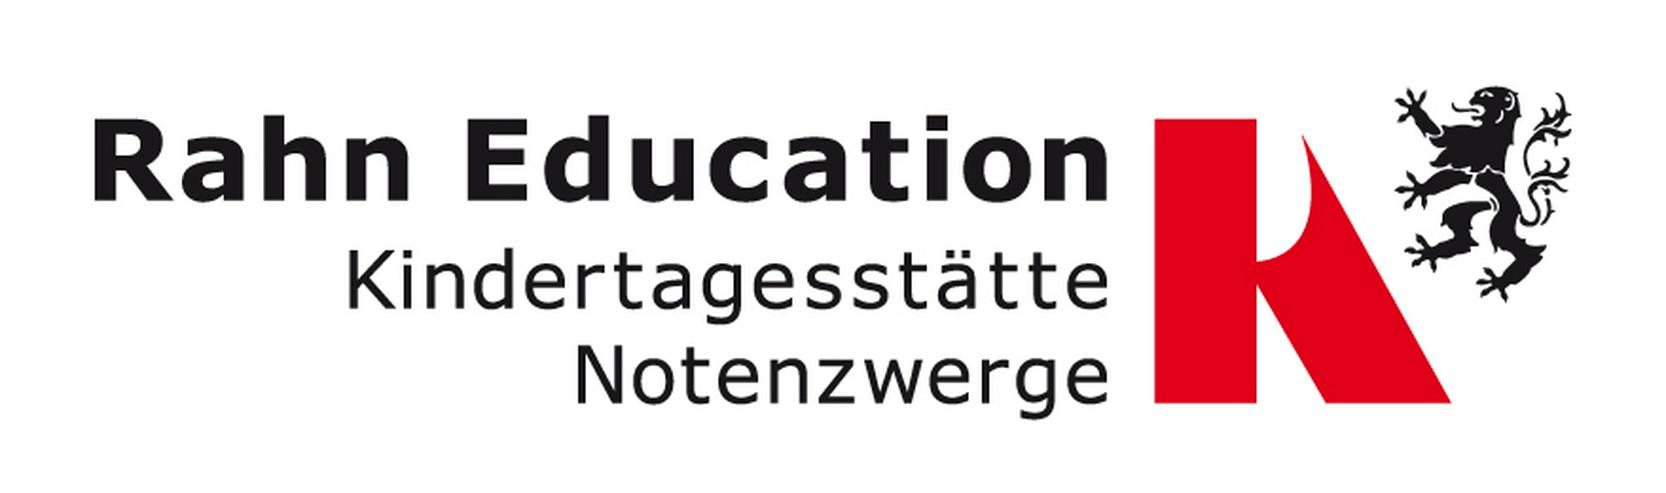 staatl. anerk. Erzieher (m/w/d) Kita Notenzwerge – Berlin - Kinder- & Jugenderziehung - Bild 1